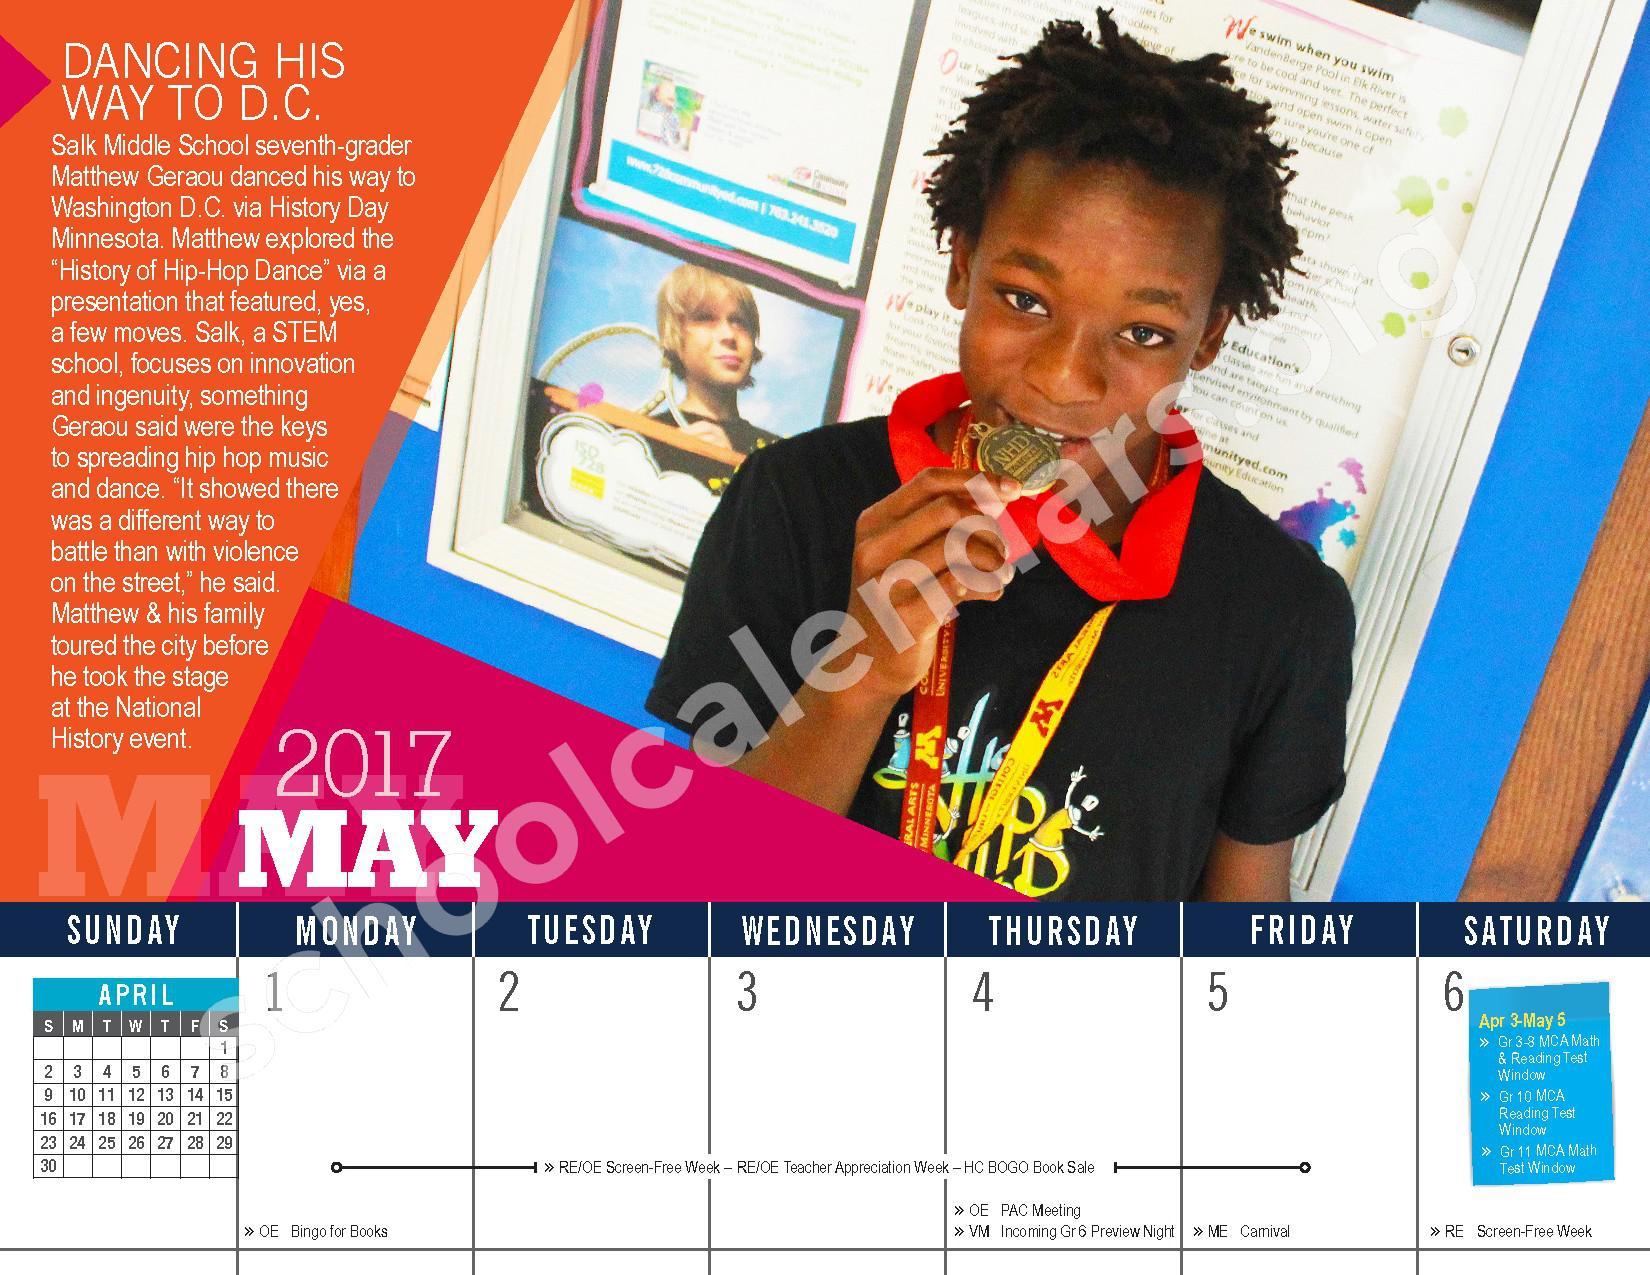 2016 - 2017 District Calendar – Vandenberge Middle School – page 22